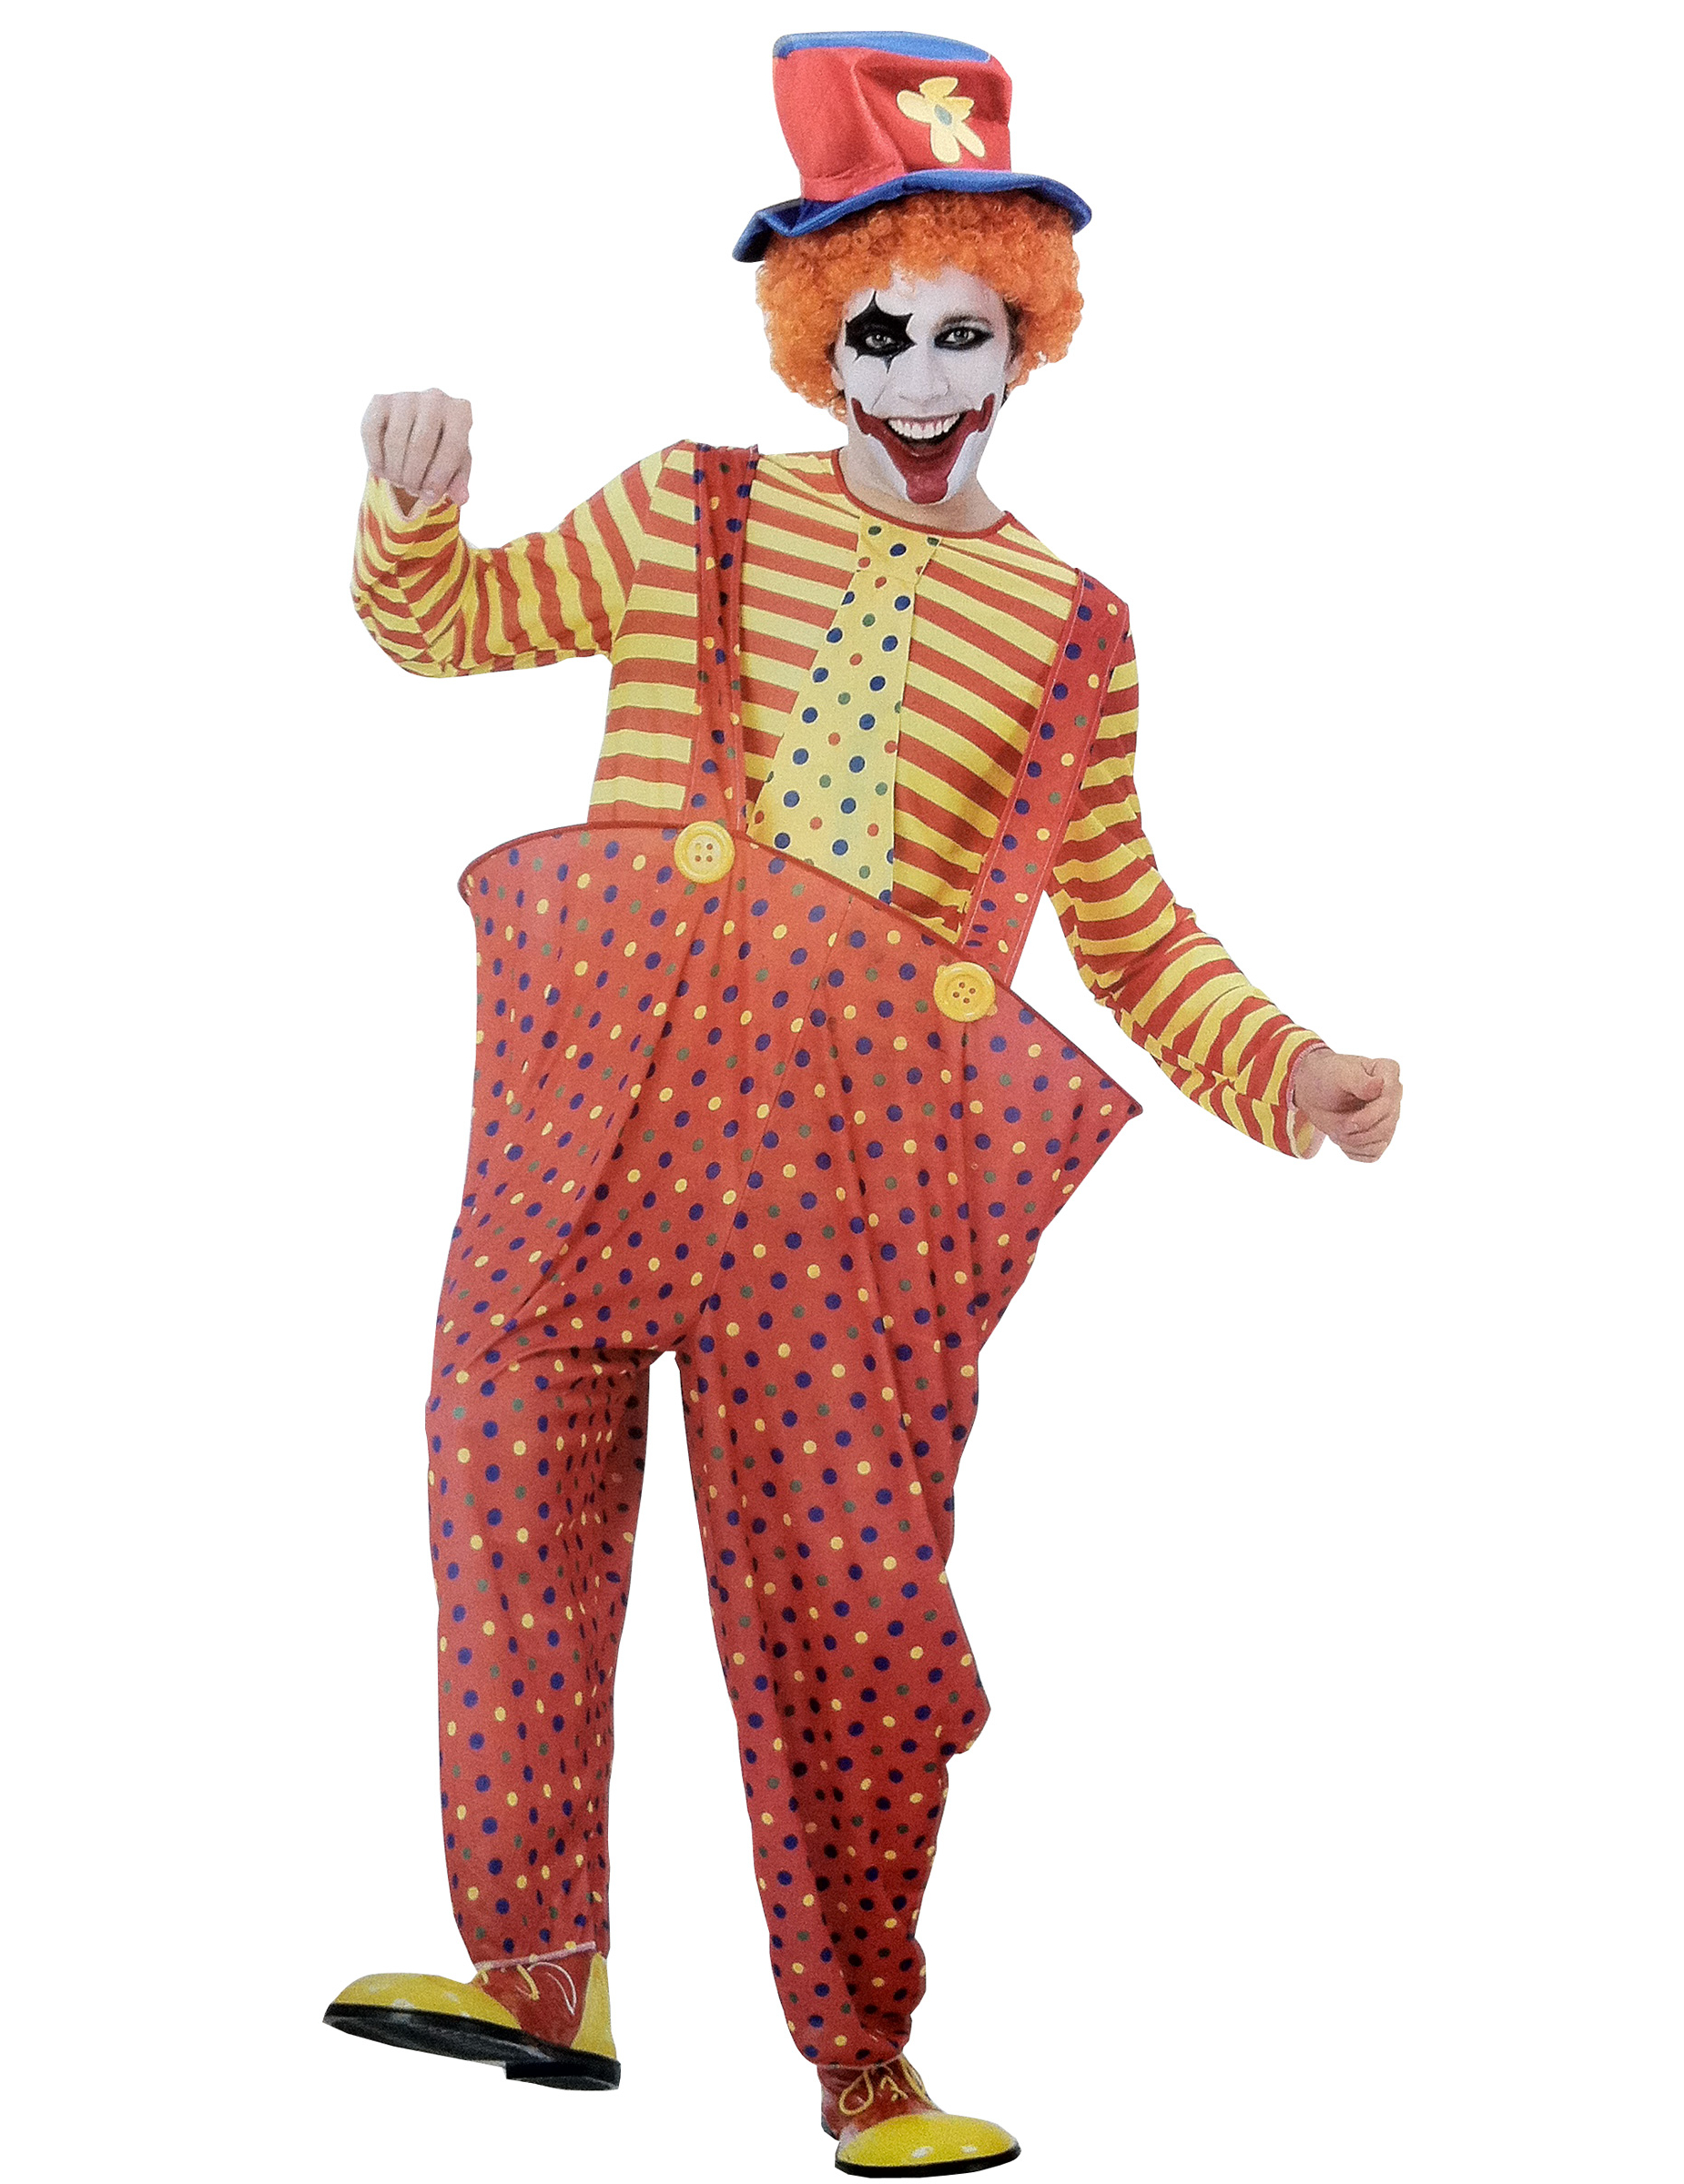 Costume da clown uomo  Costumi adulti e vestiti di 20a8eacac5a0